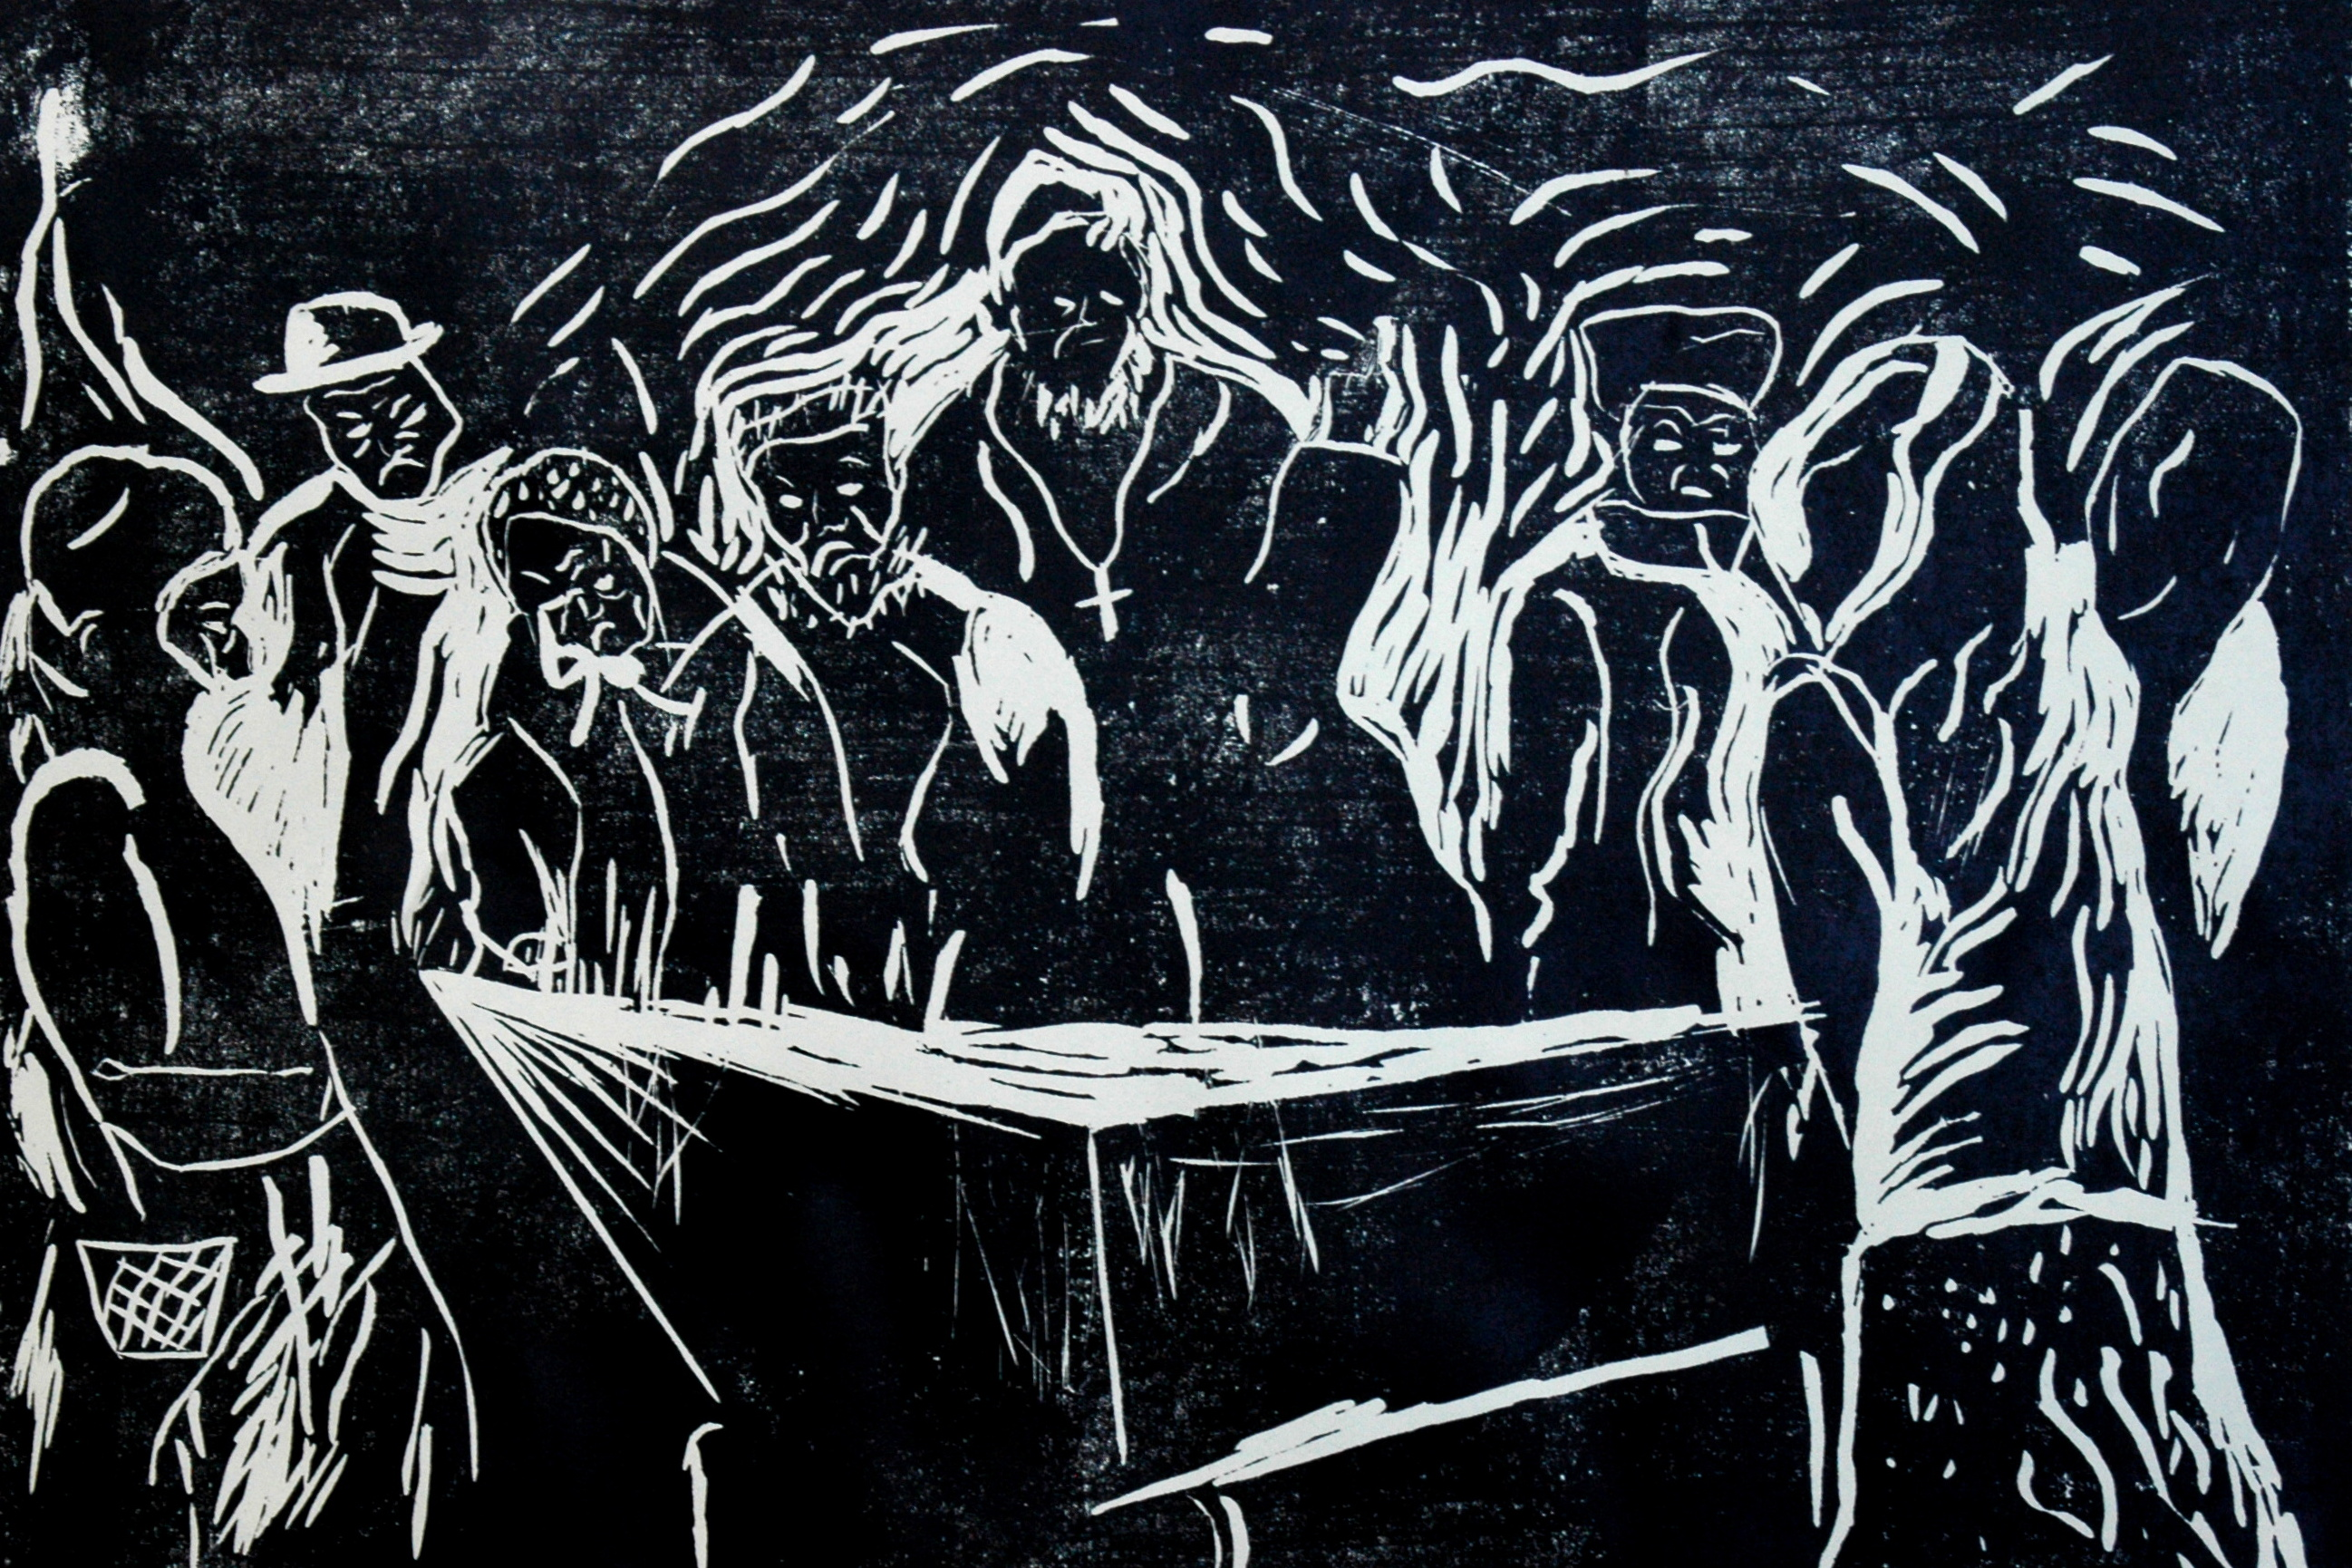 funeral-march_yelyzaveta